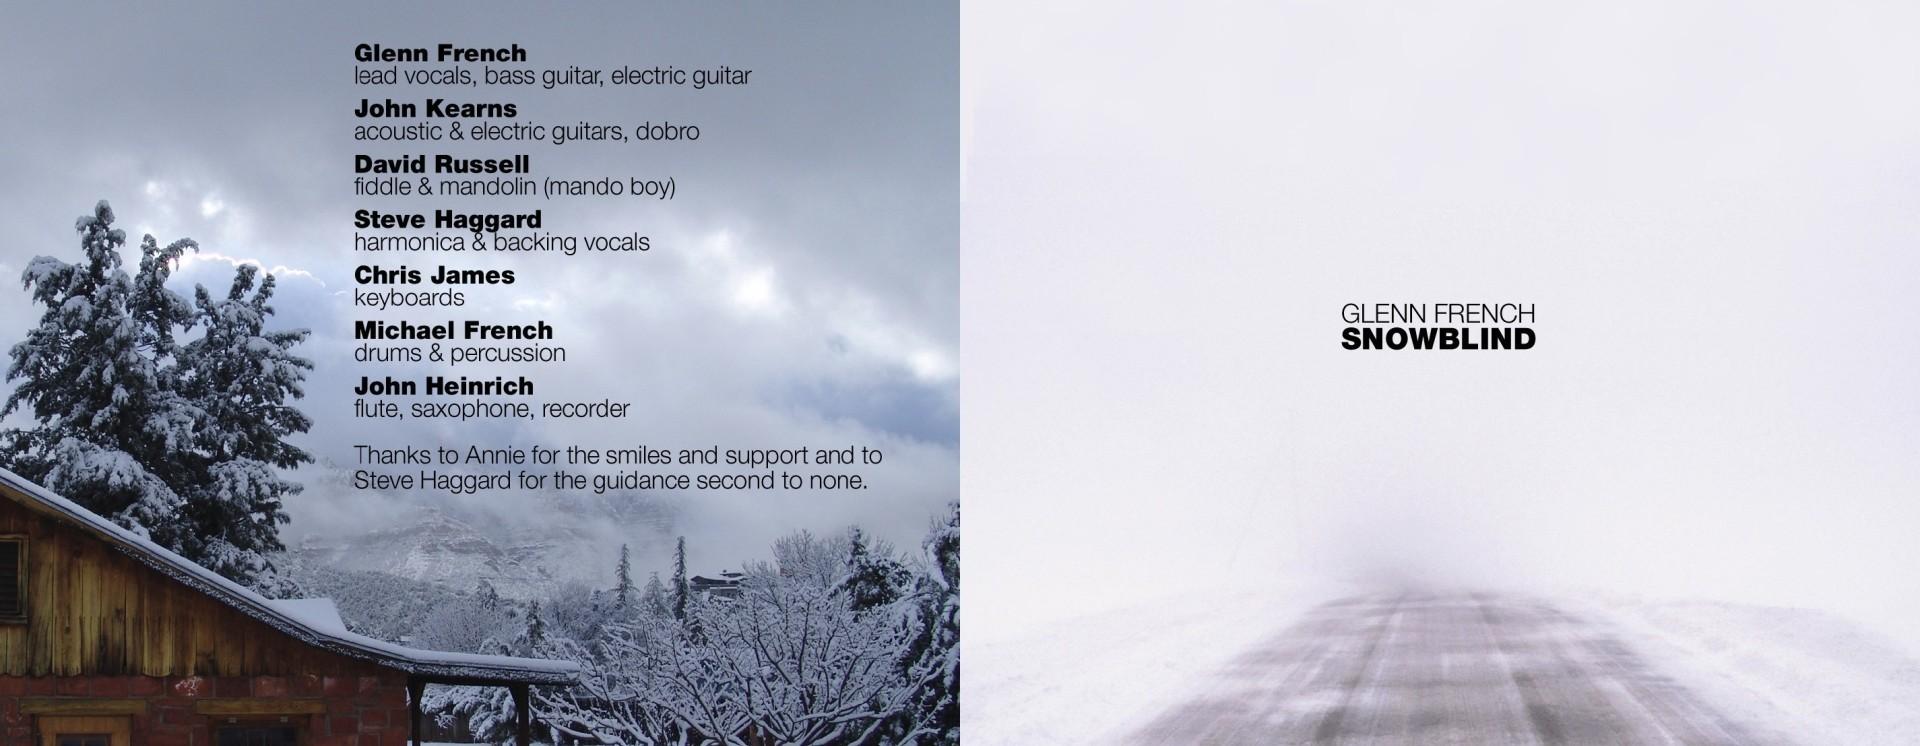 1458519785 snowblind cd front copy